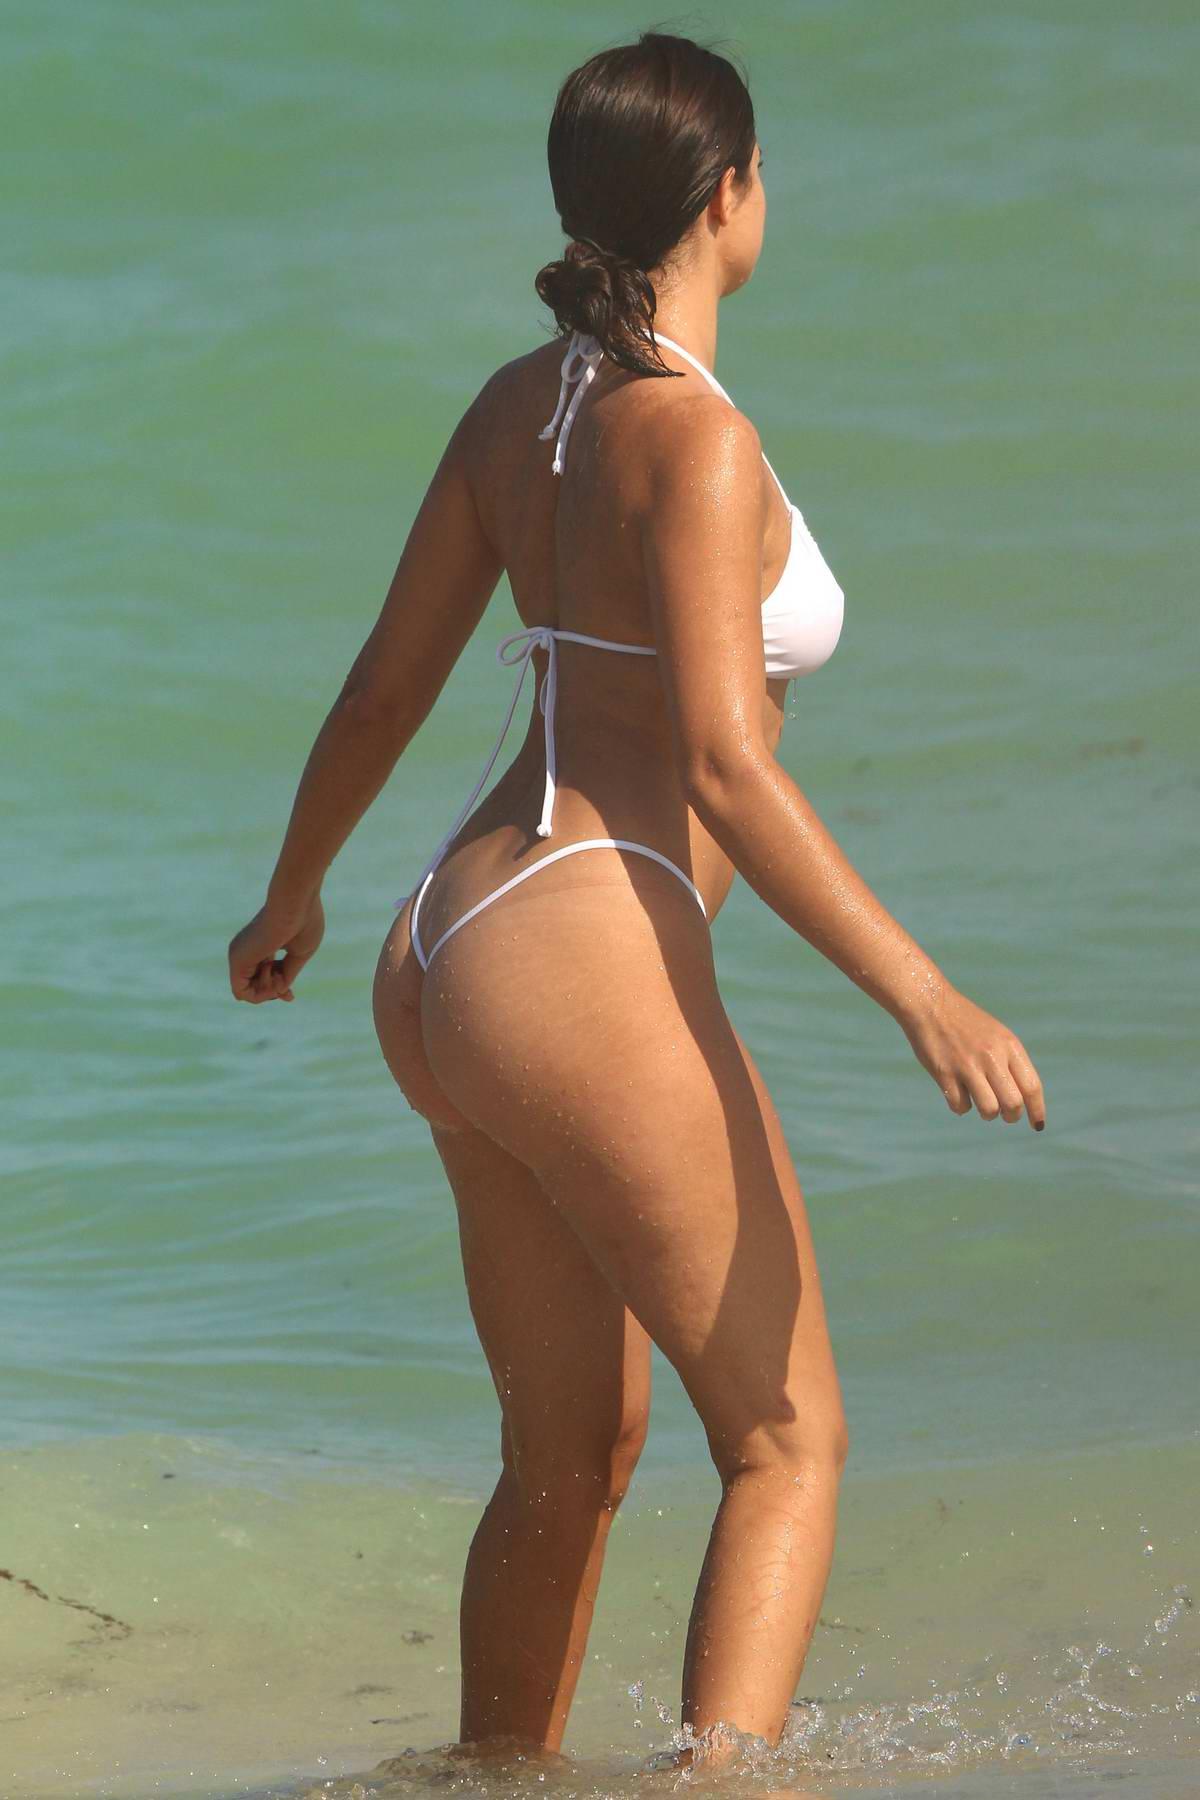 Bruna marquezine naked in brazilian soap opera wwwamadorastaradascom - 4 1